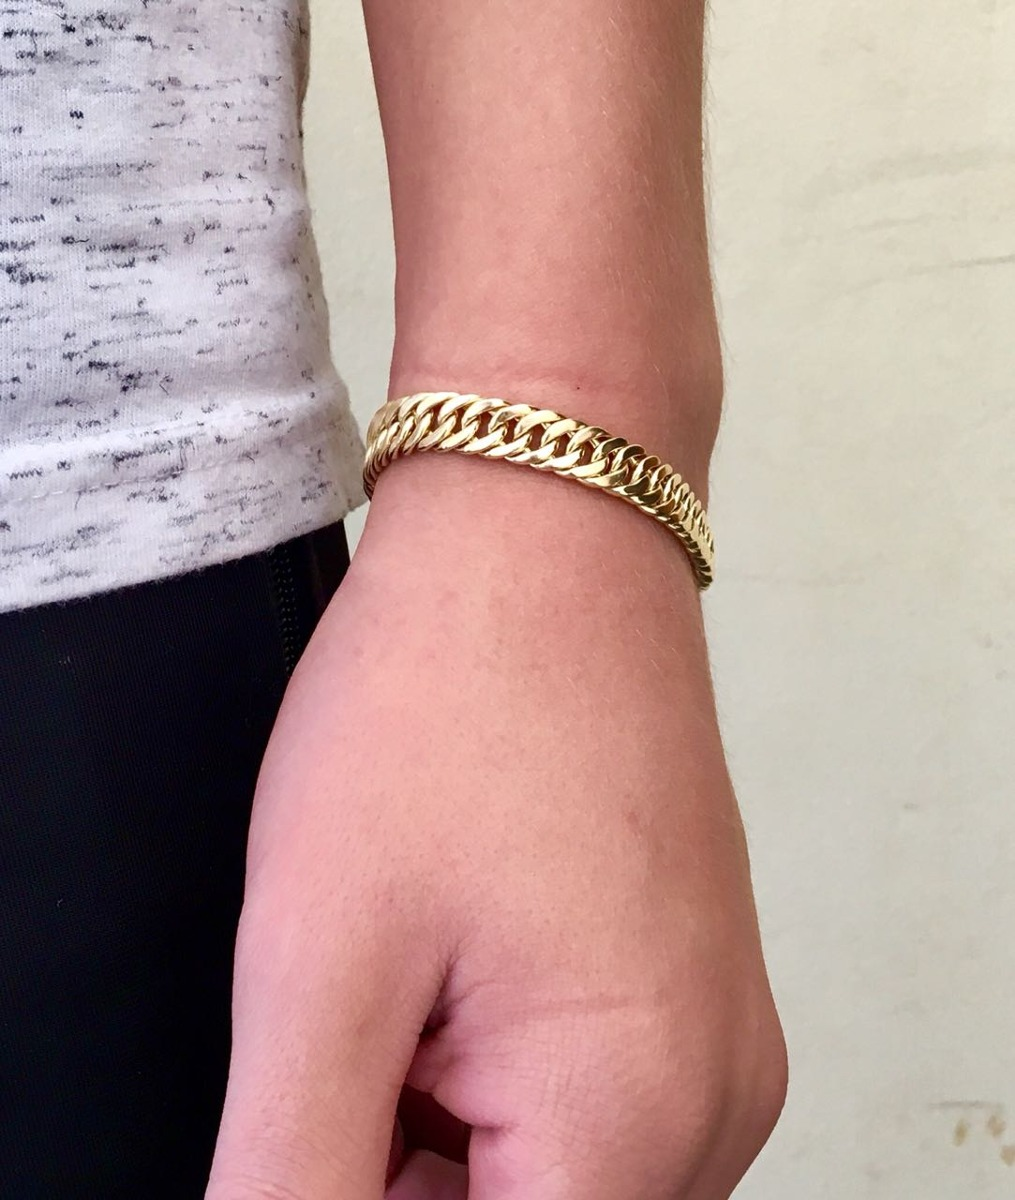 576a12ee74d2c pulseira 9mm banhada ouro 18k masculina feminina de 17- 21mm. Carregando  zoom.